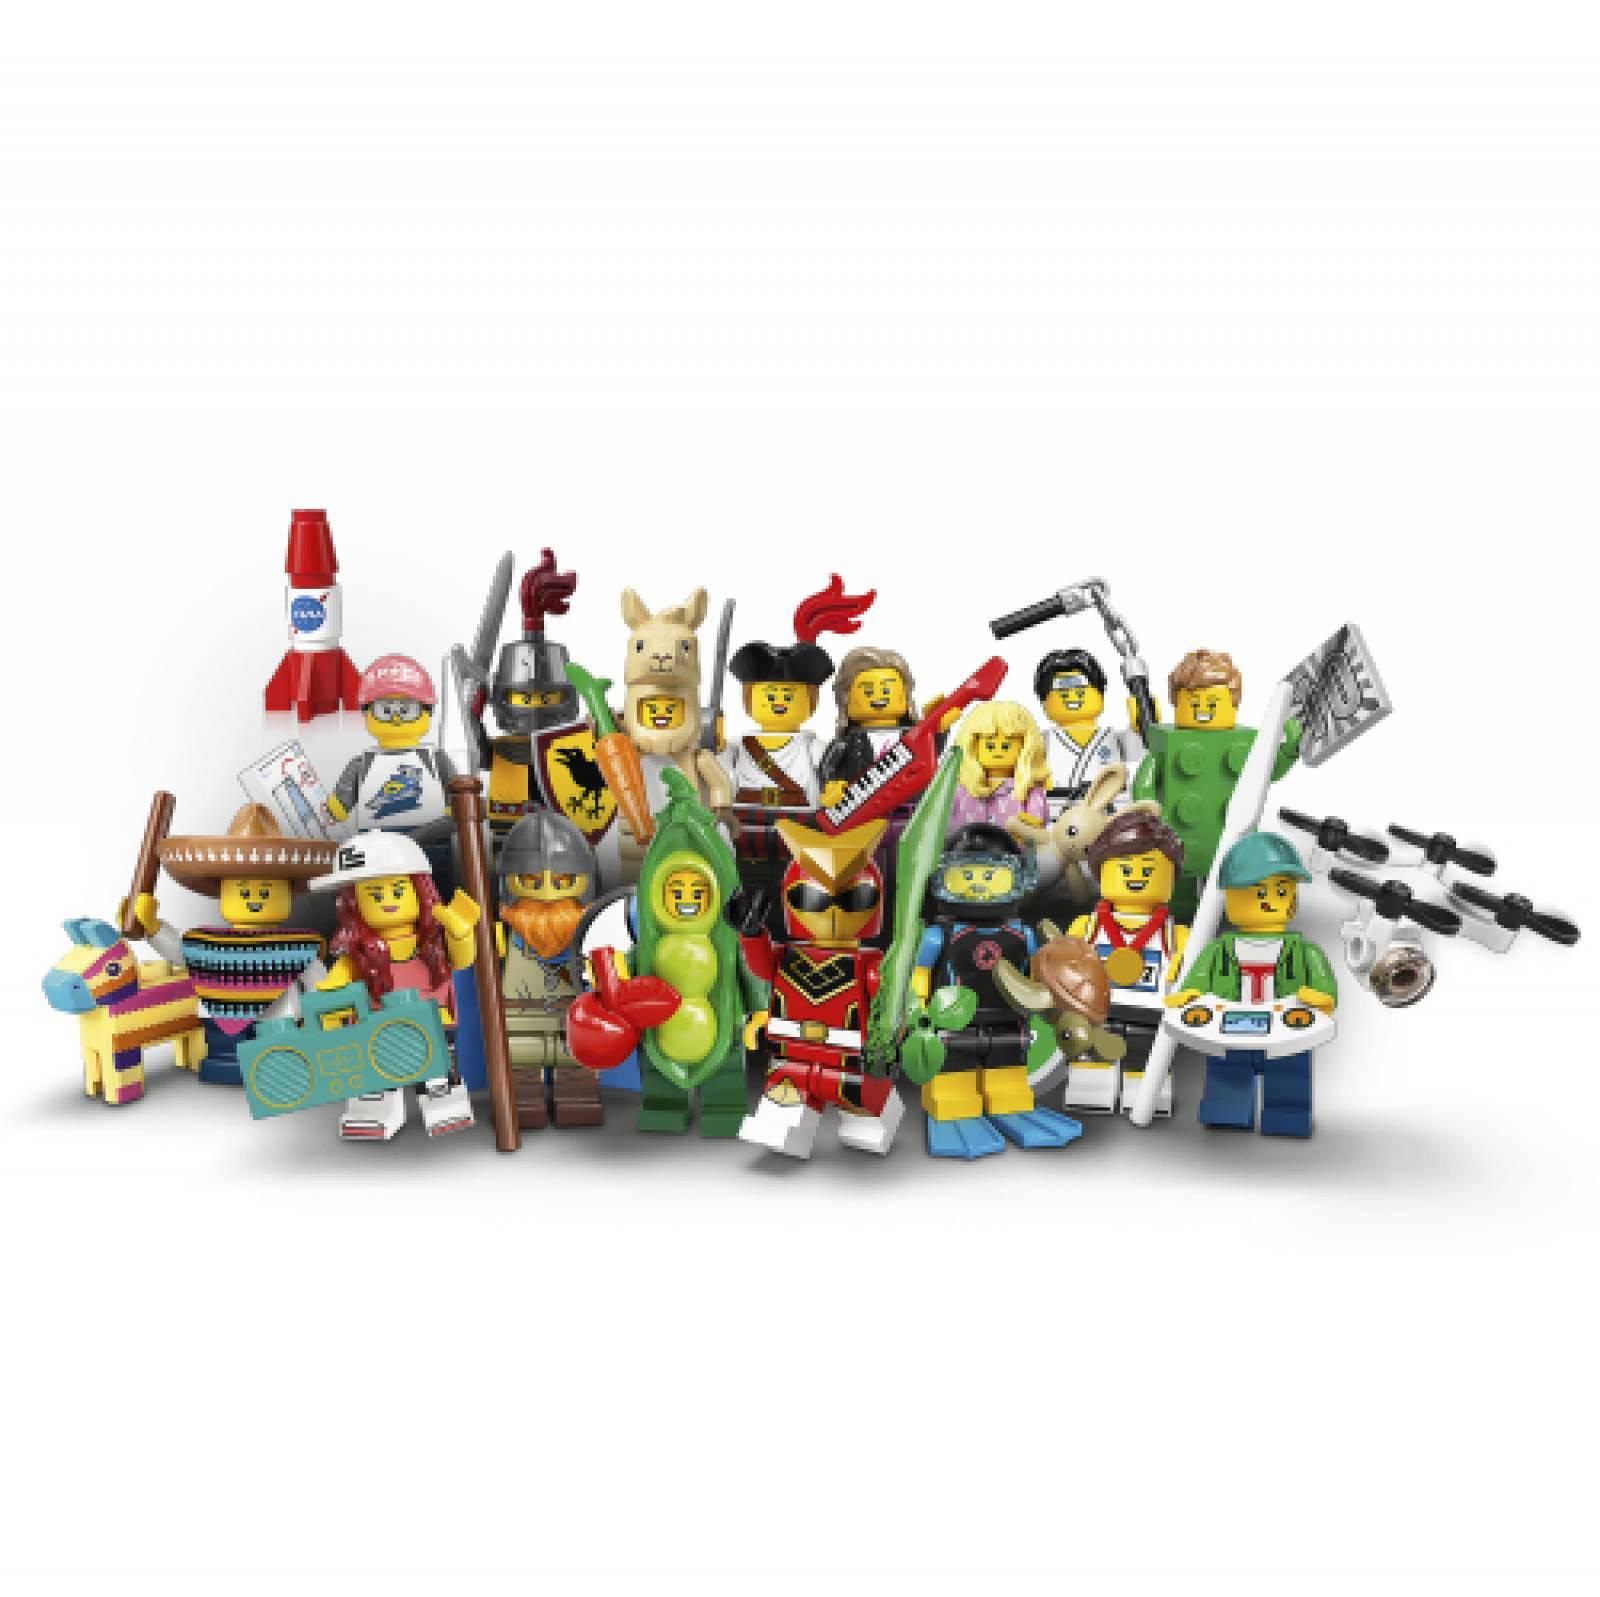 LEGO Minifigure Series 20 thumbnails